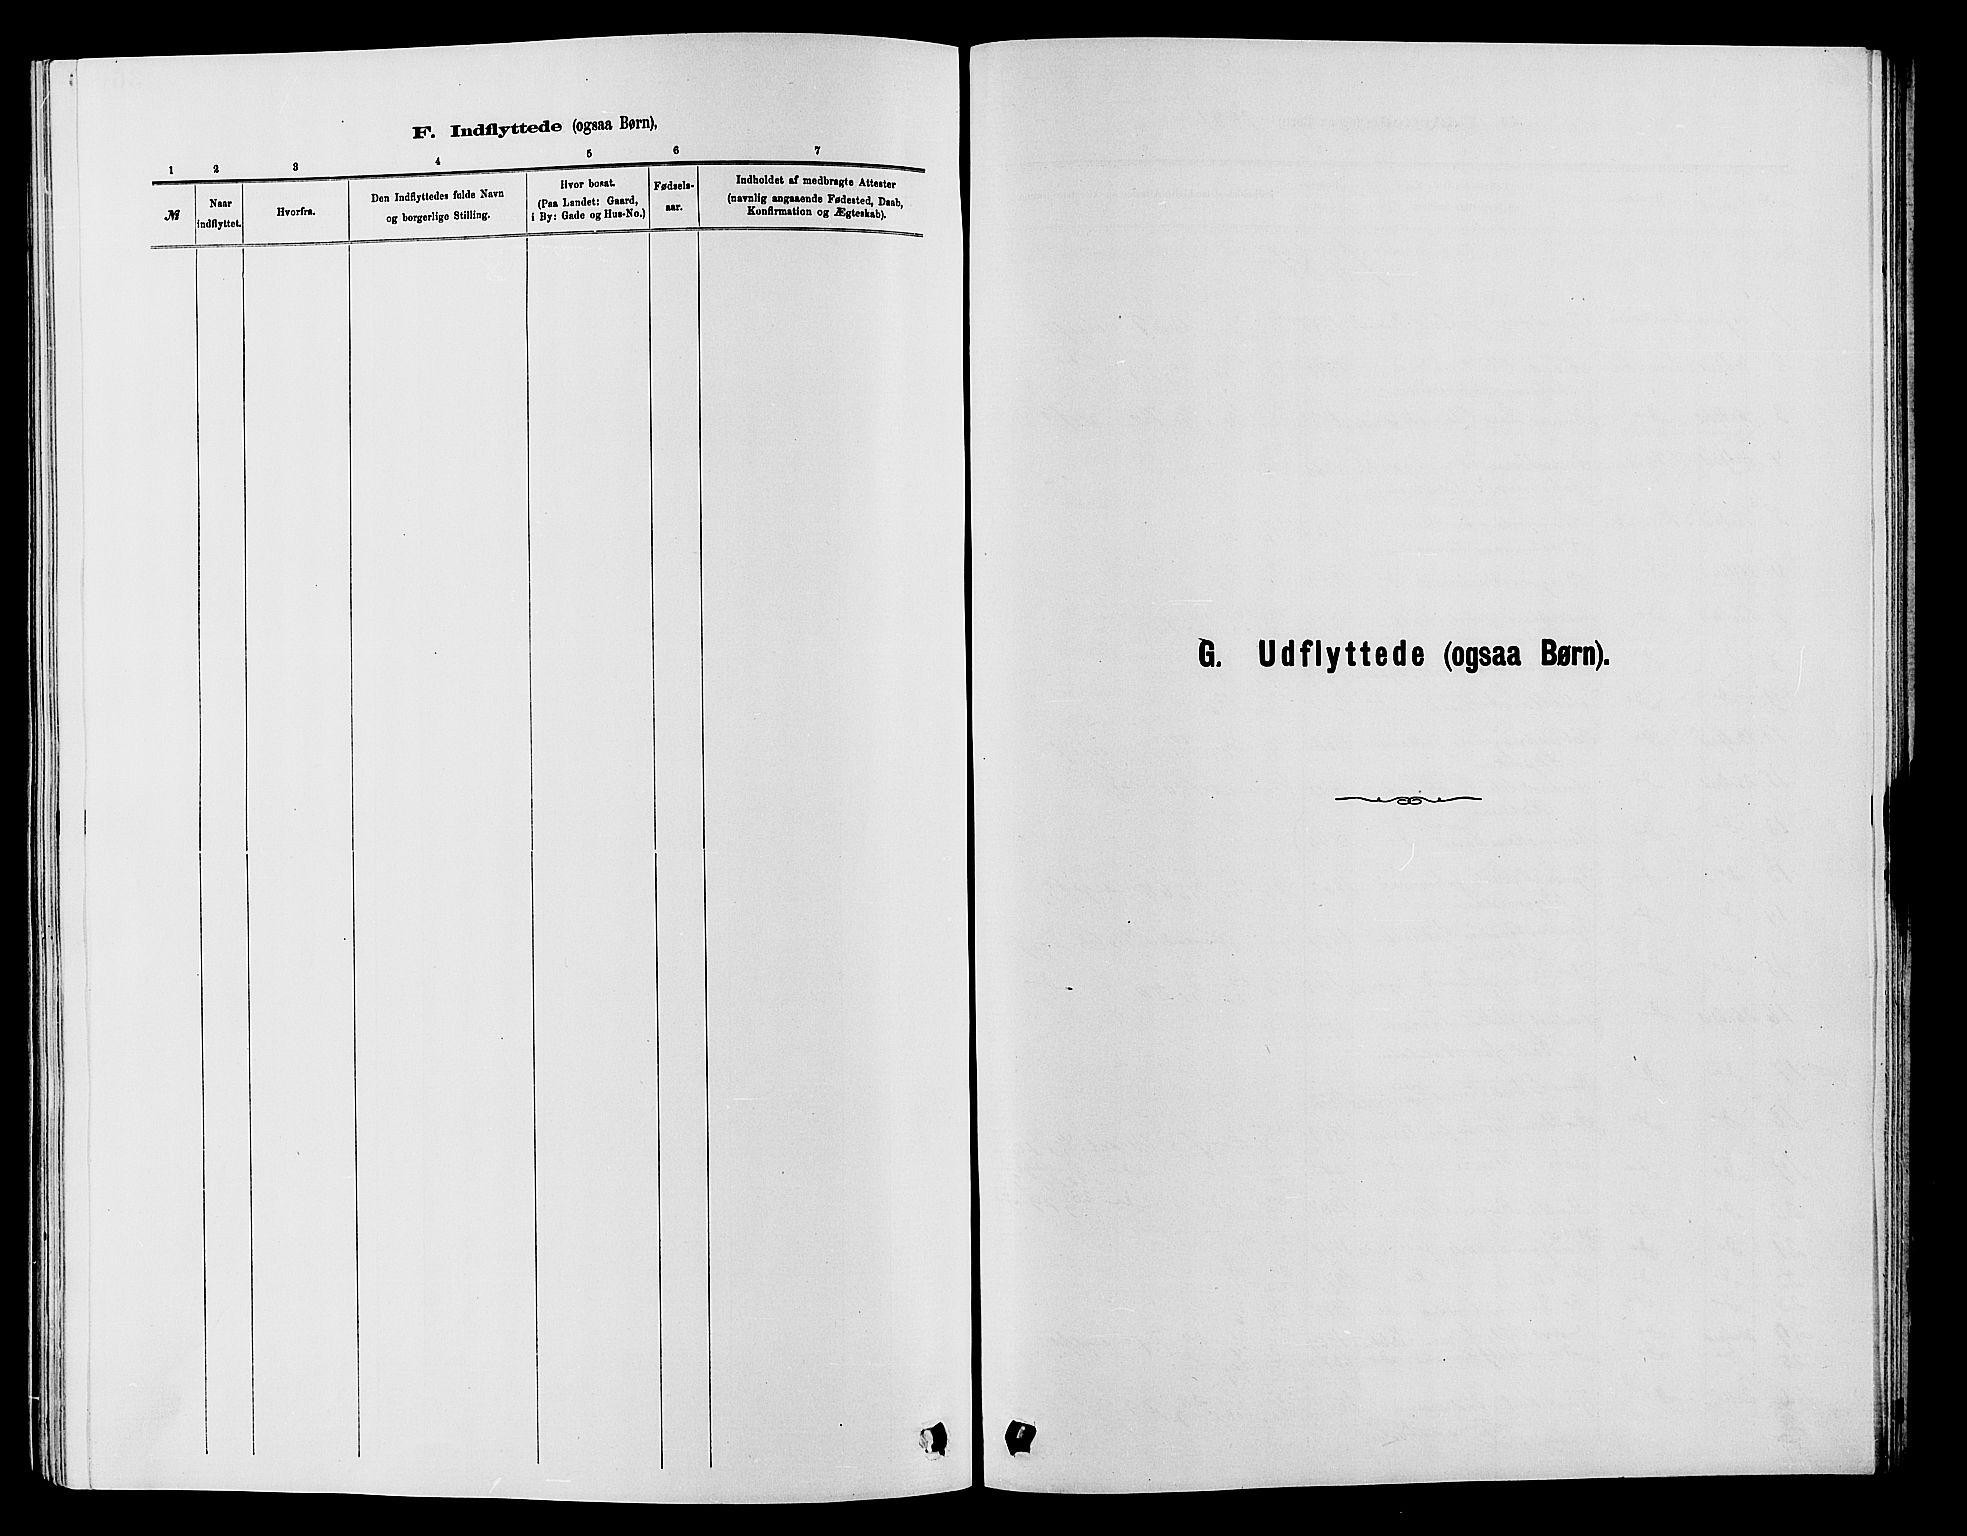 SAH, Vardal prestekontor, H/Ha/Hab/L0007: Klokkerbok nr. 7 /1, 1881-1895